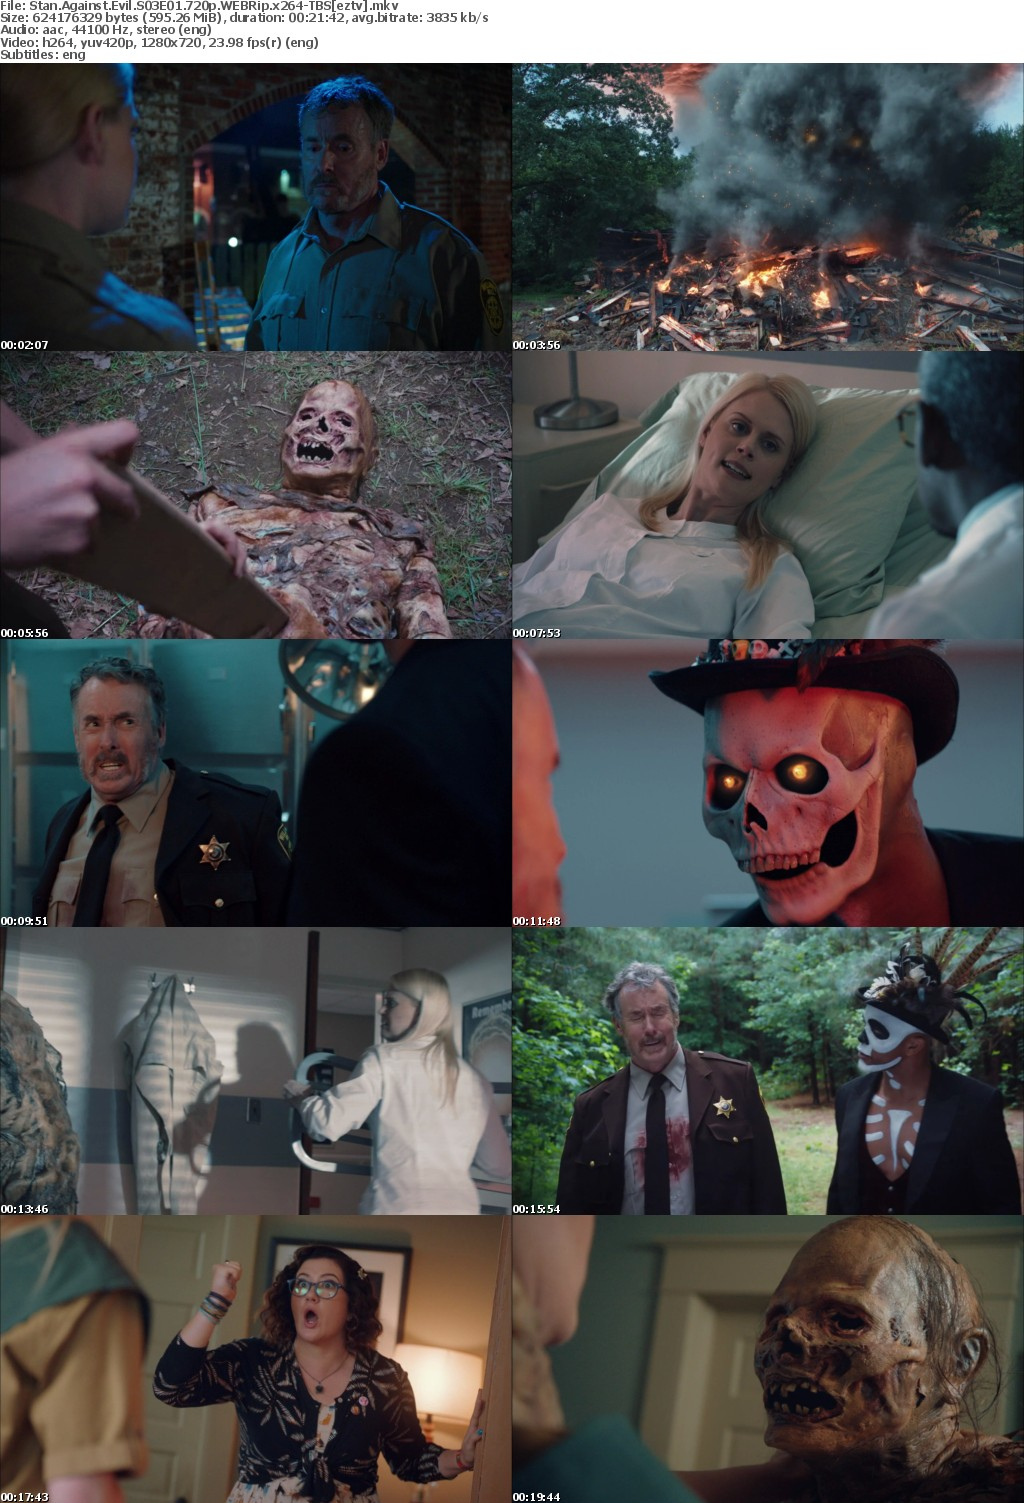 Stan Against Evil S03E01 720p WEBRip x264-TBS